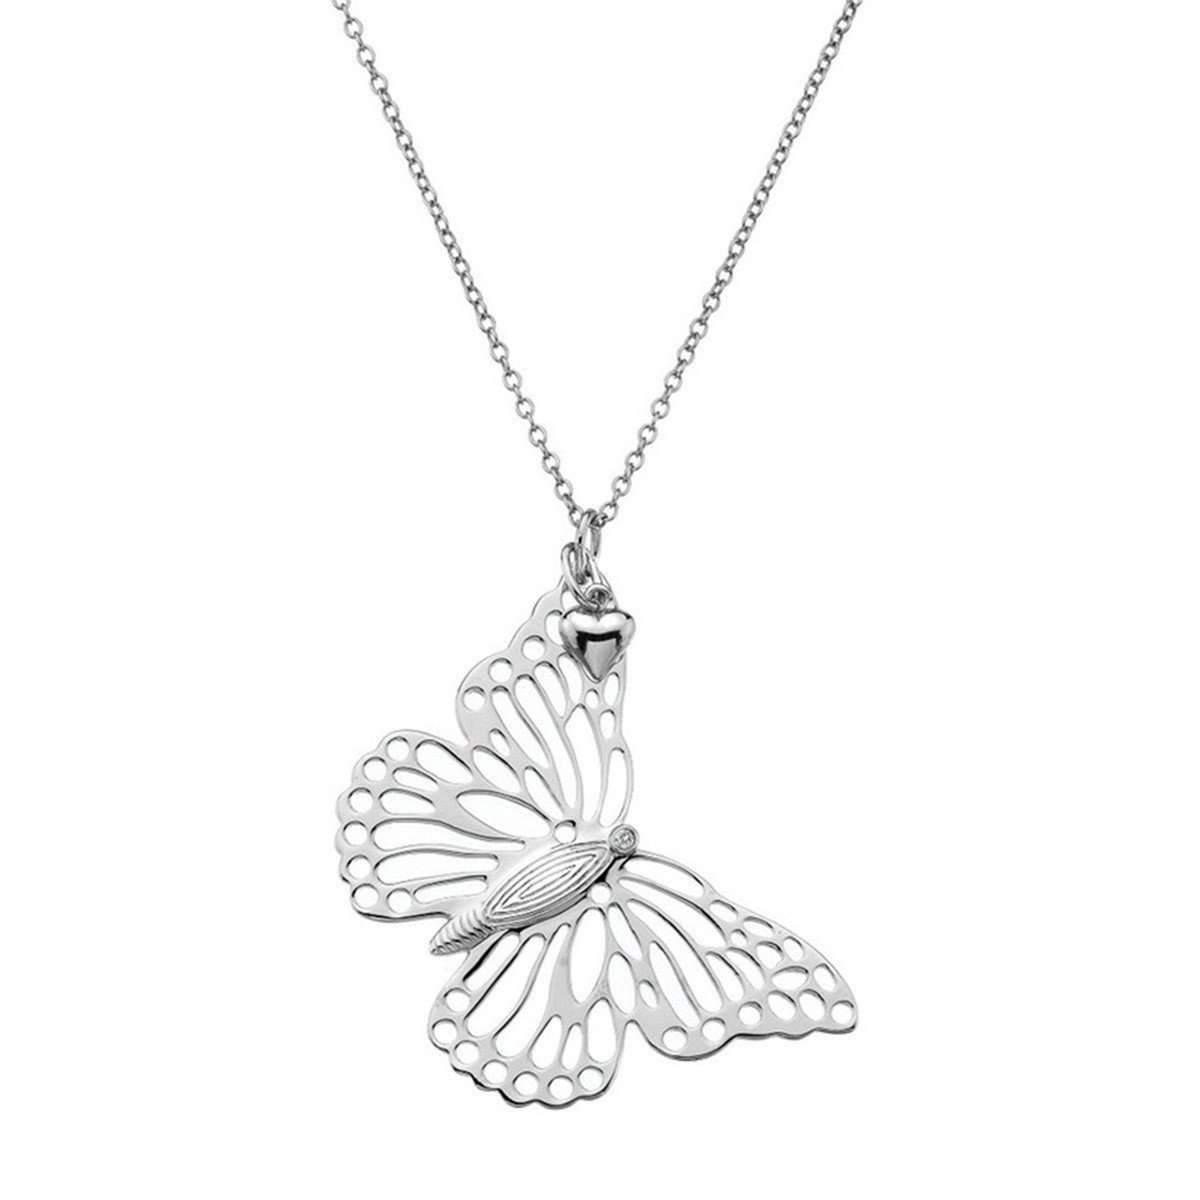 Lily & Lotty Ellice Silver & Diamond Long Necklace aFg1F8L